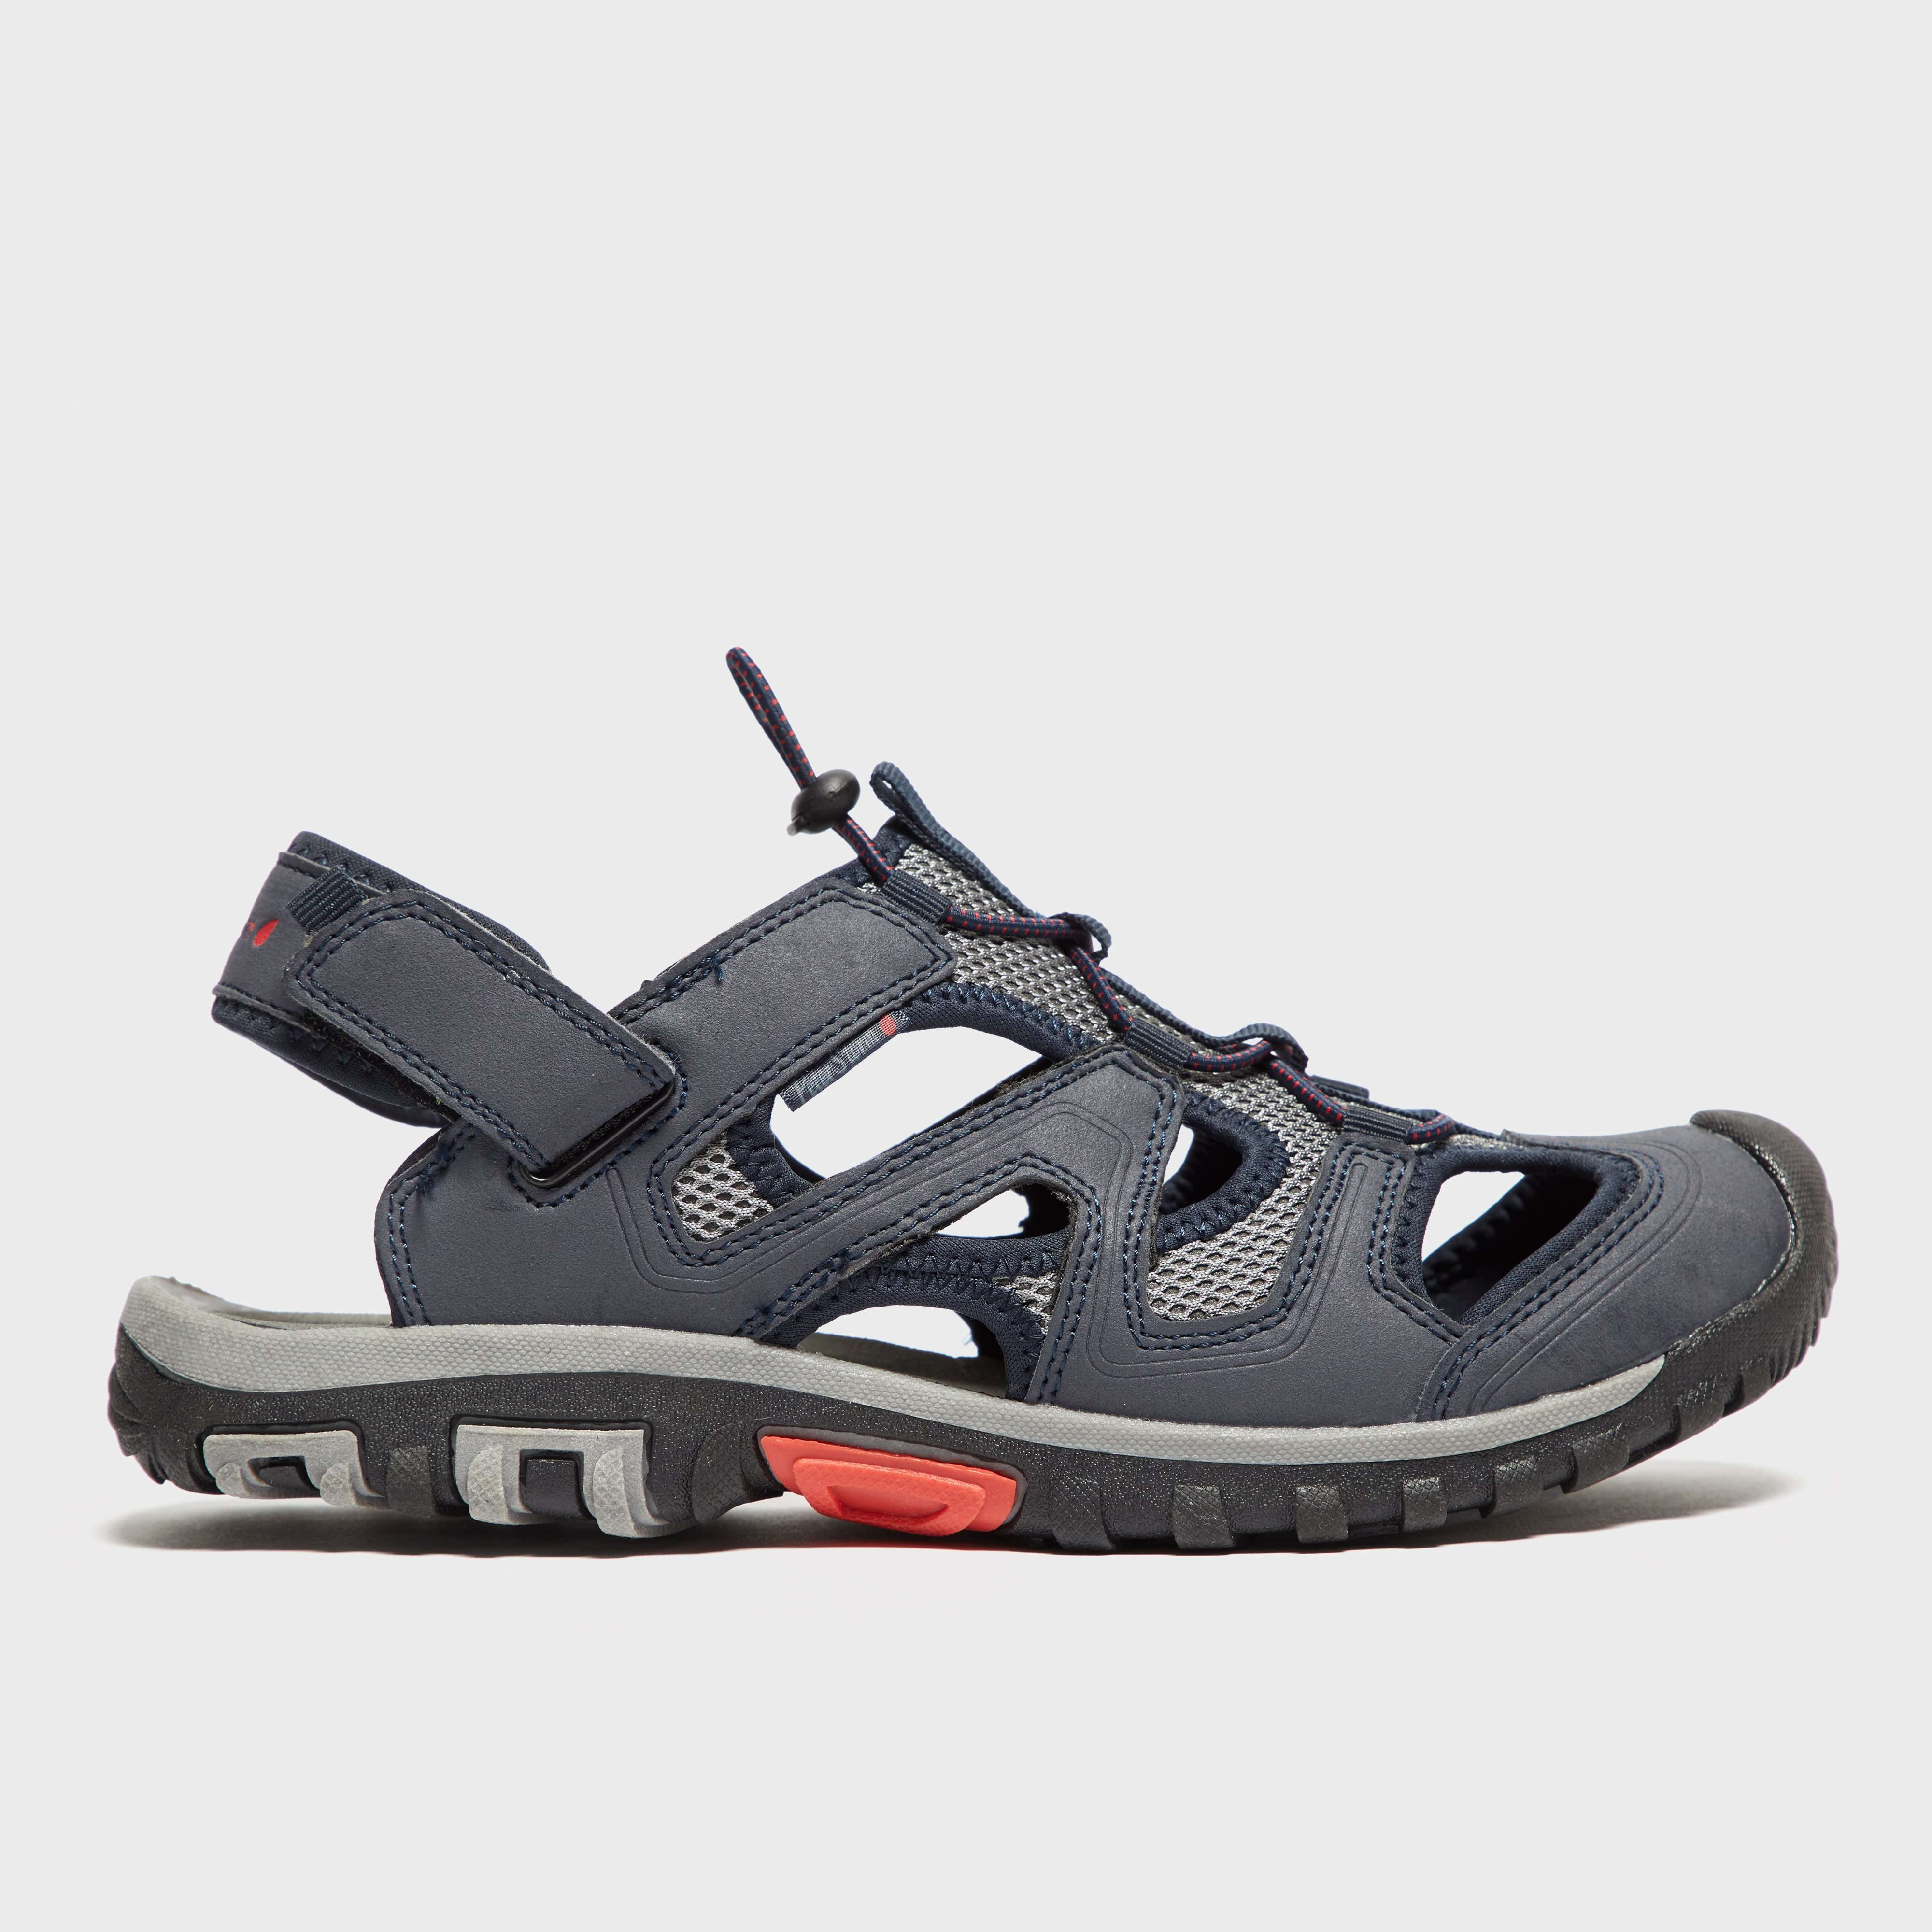 PETER STORM Men's Sennen Sandal